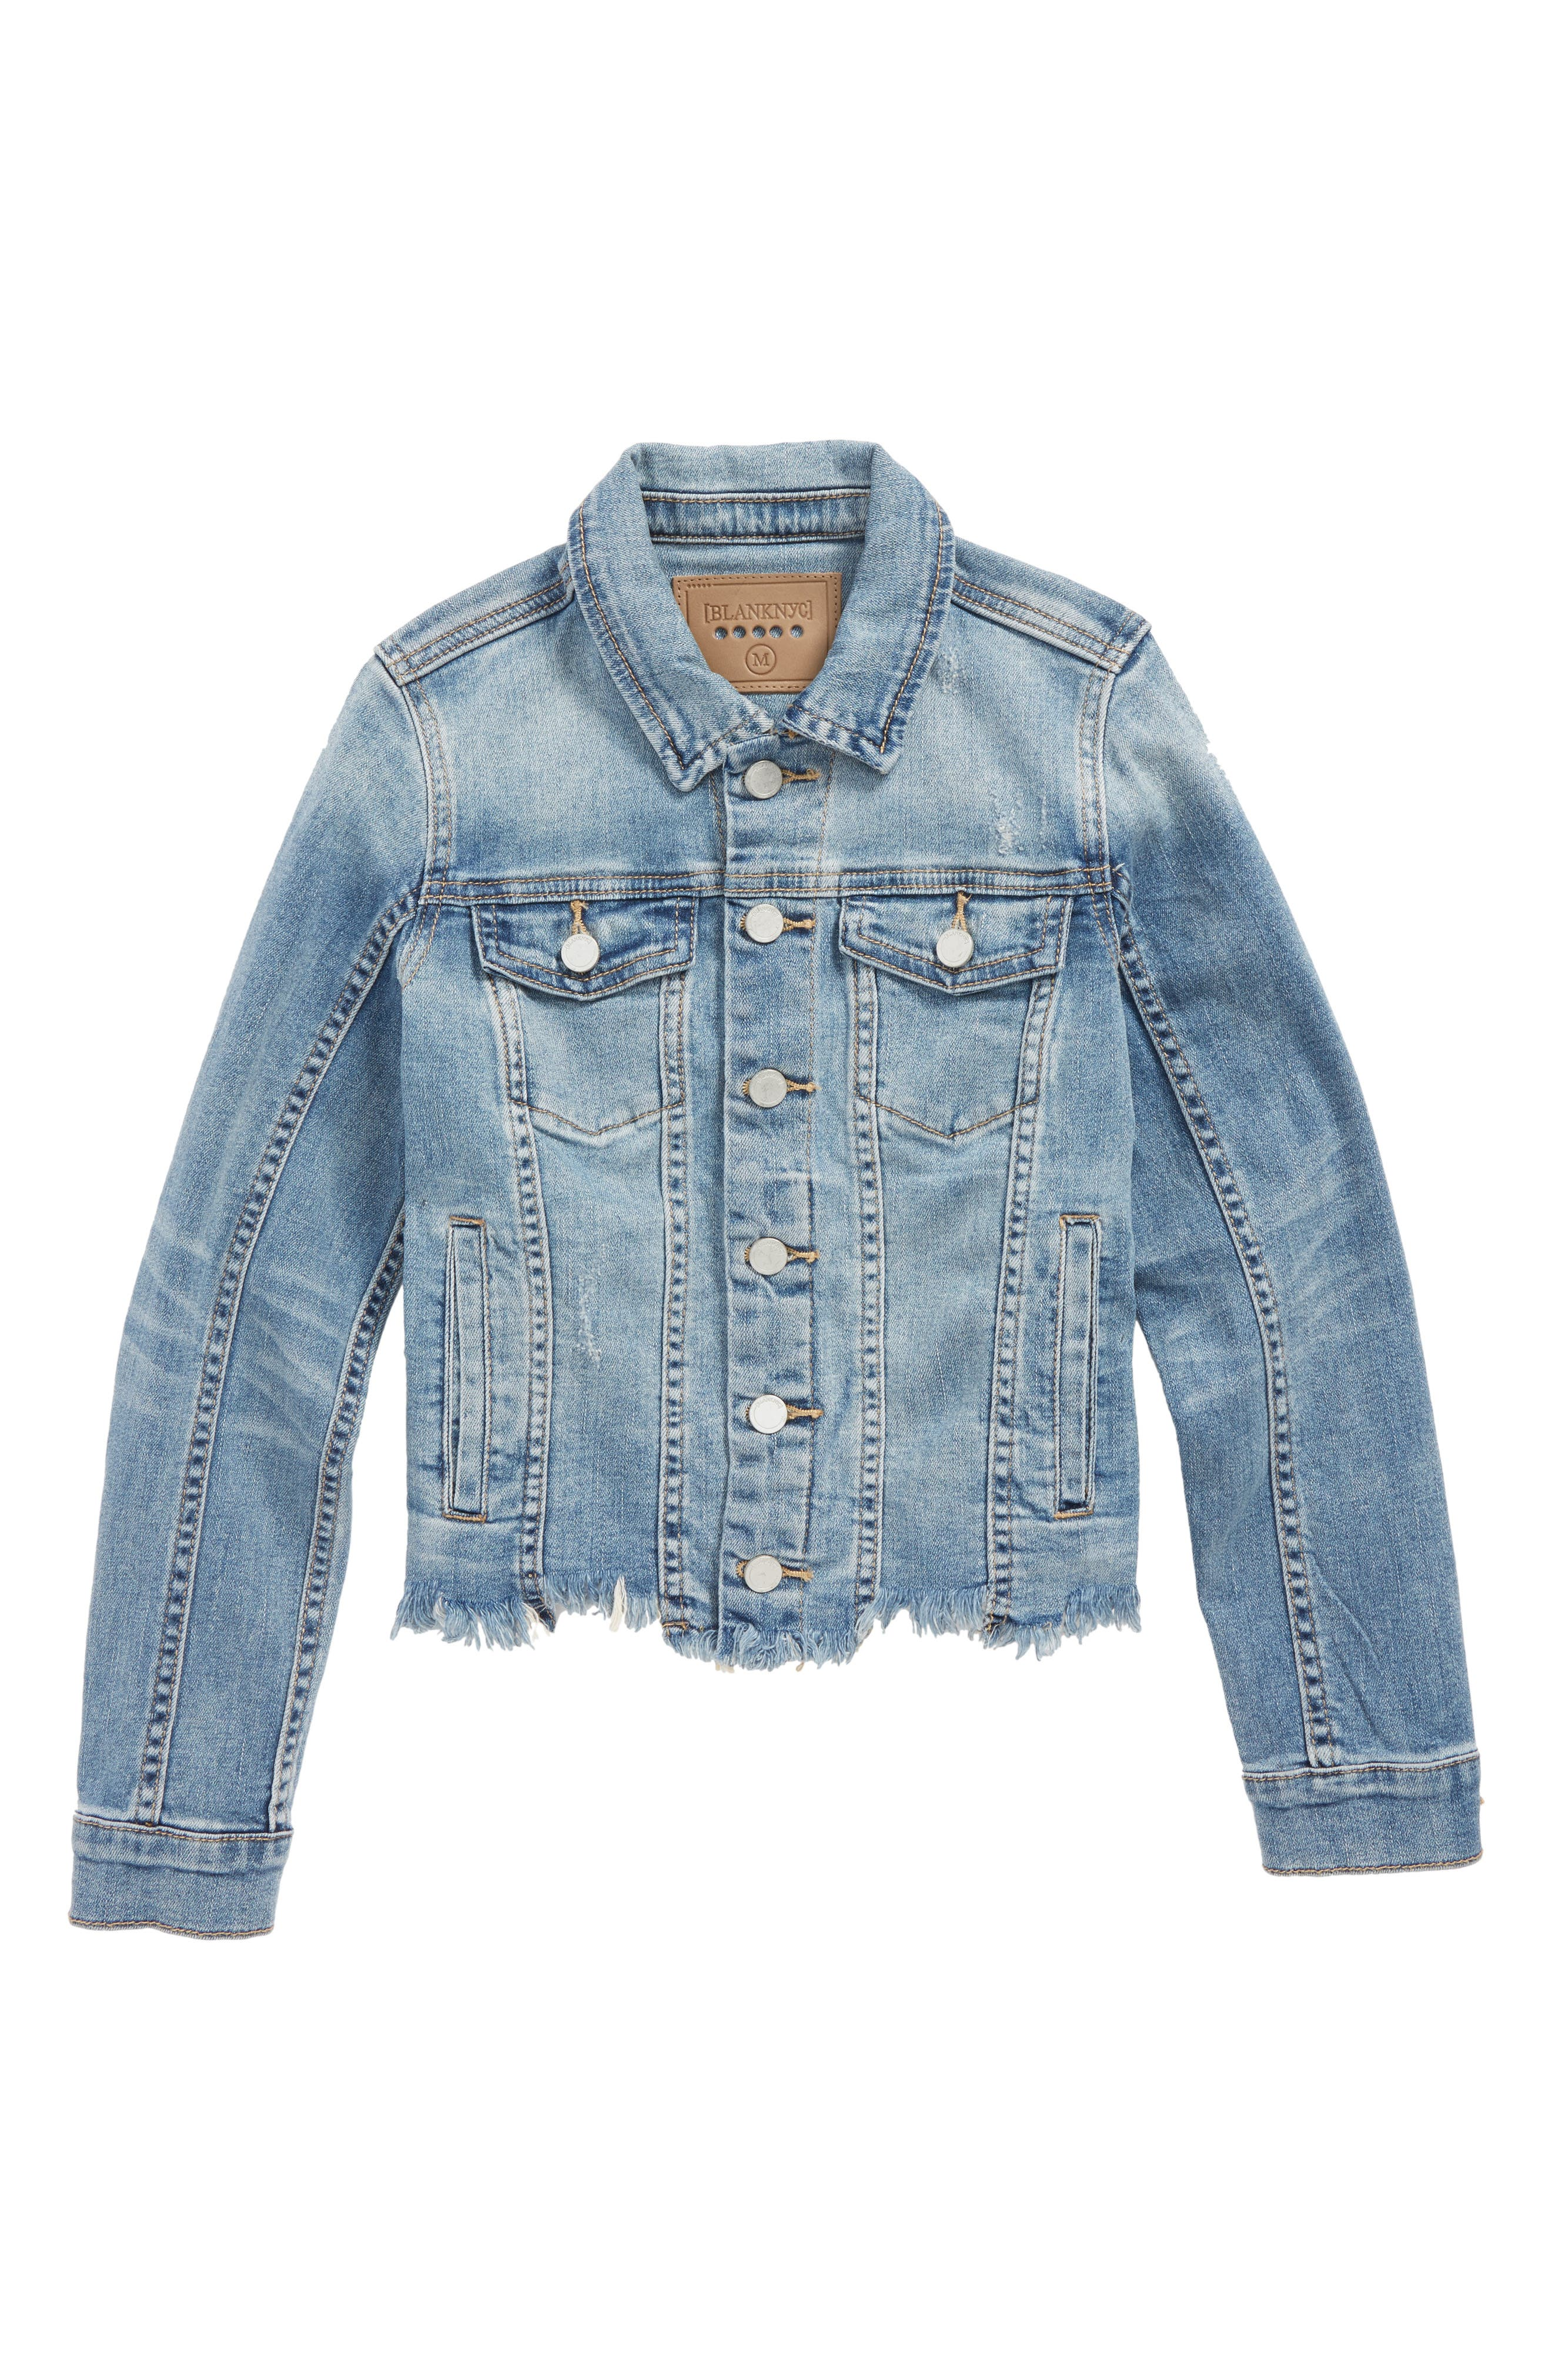 Distressed Denim Jacket,                             Main thumbnail 1, color,                             420